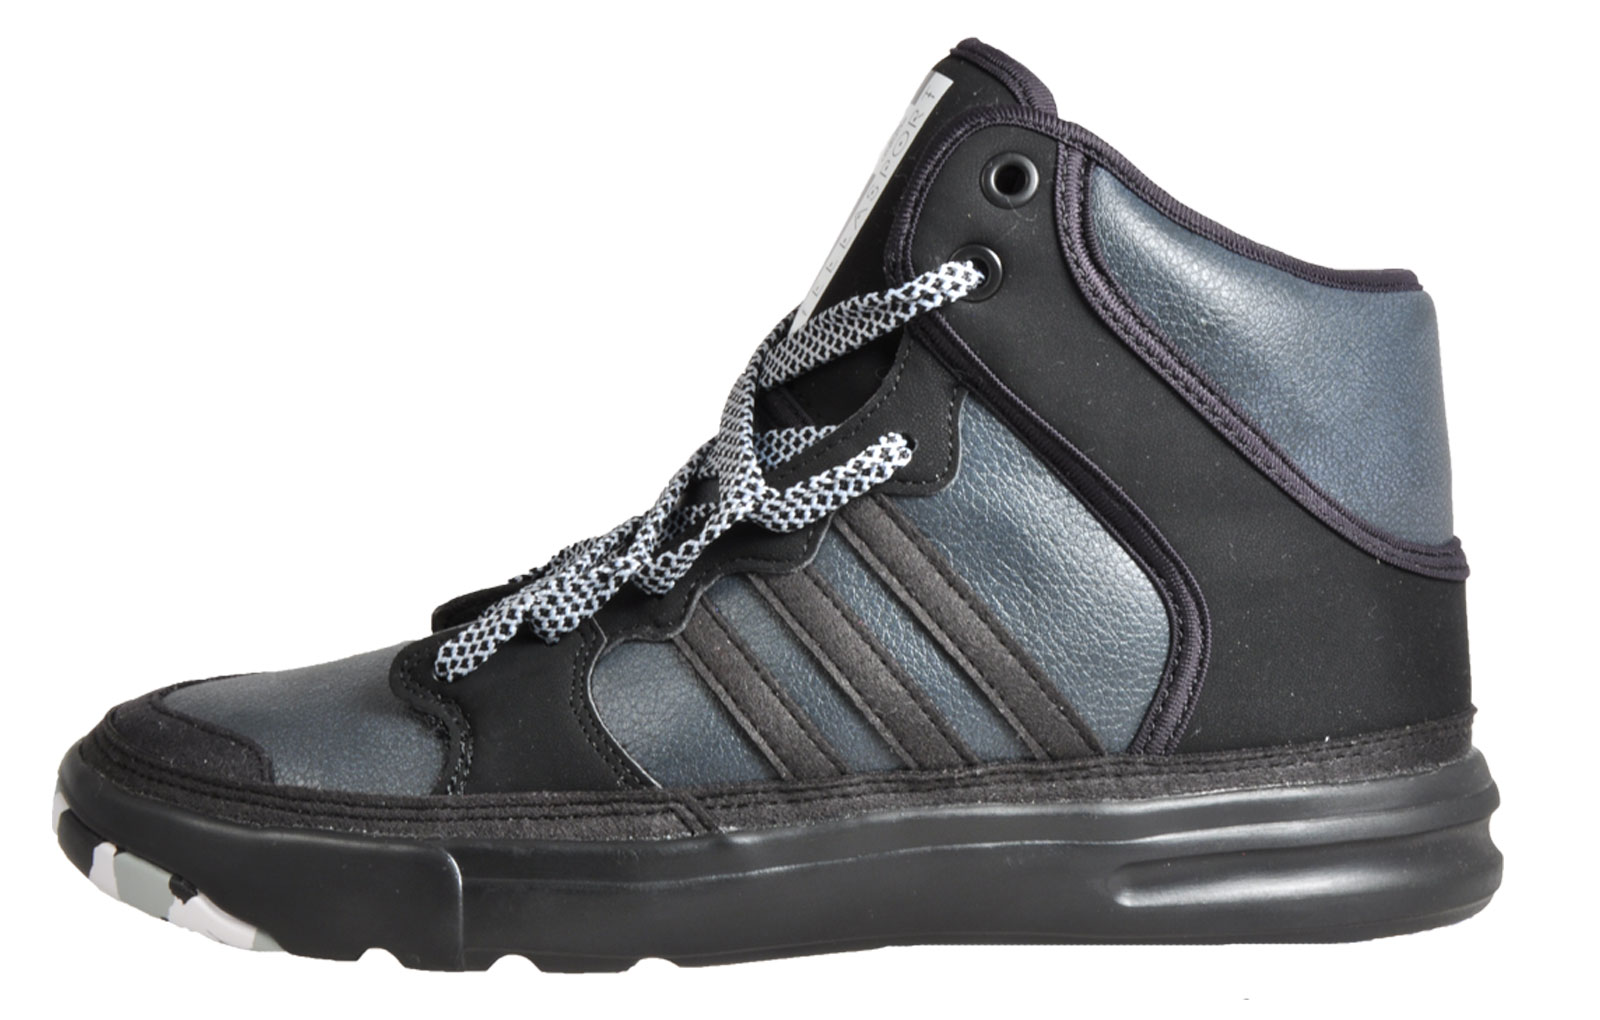 Adidas Stellasport Irana Sko lzxWlyC45